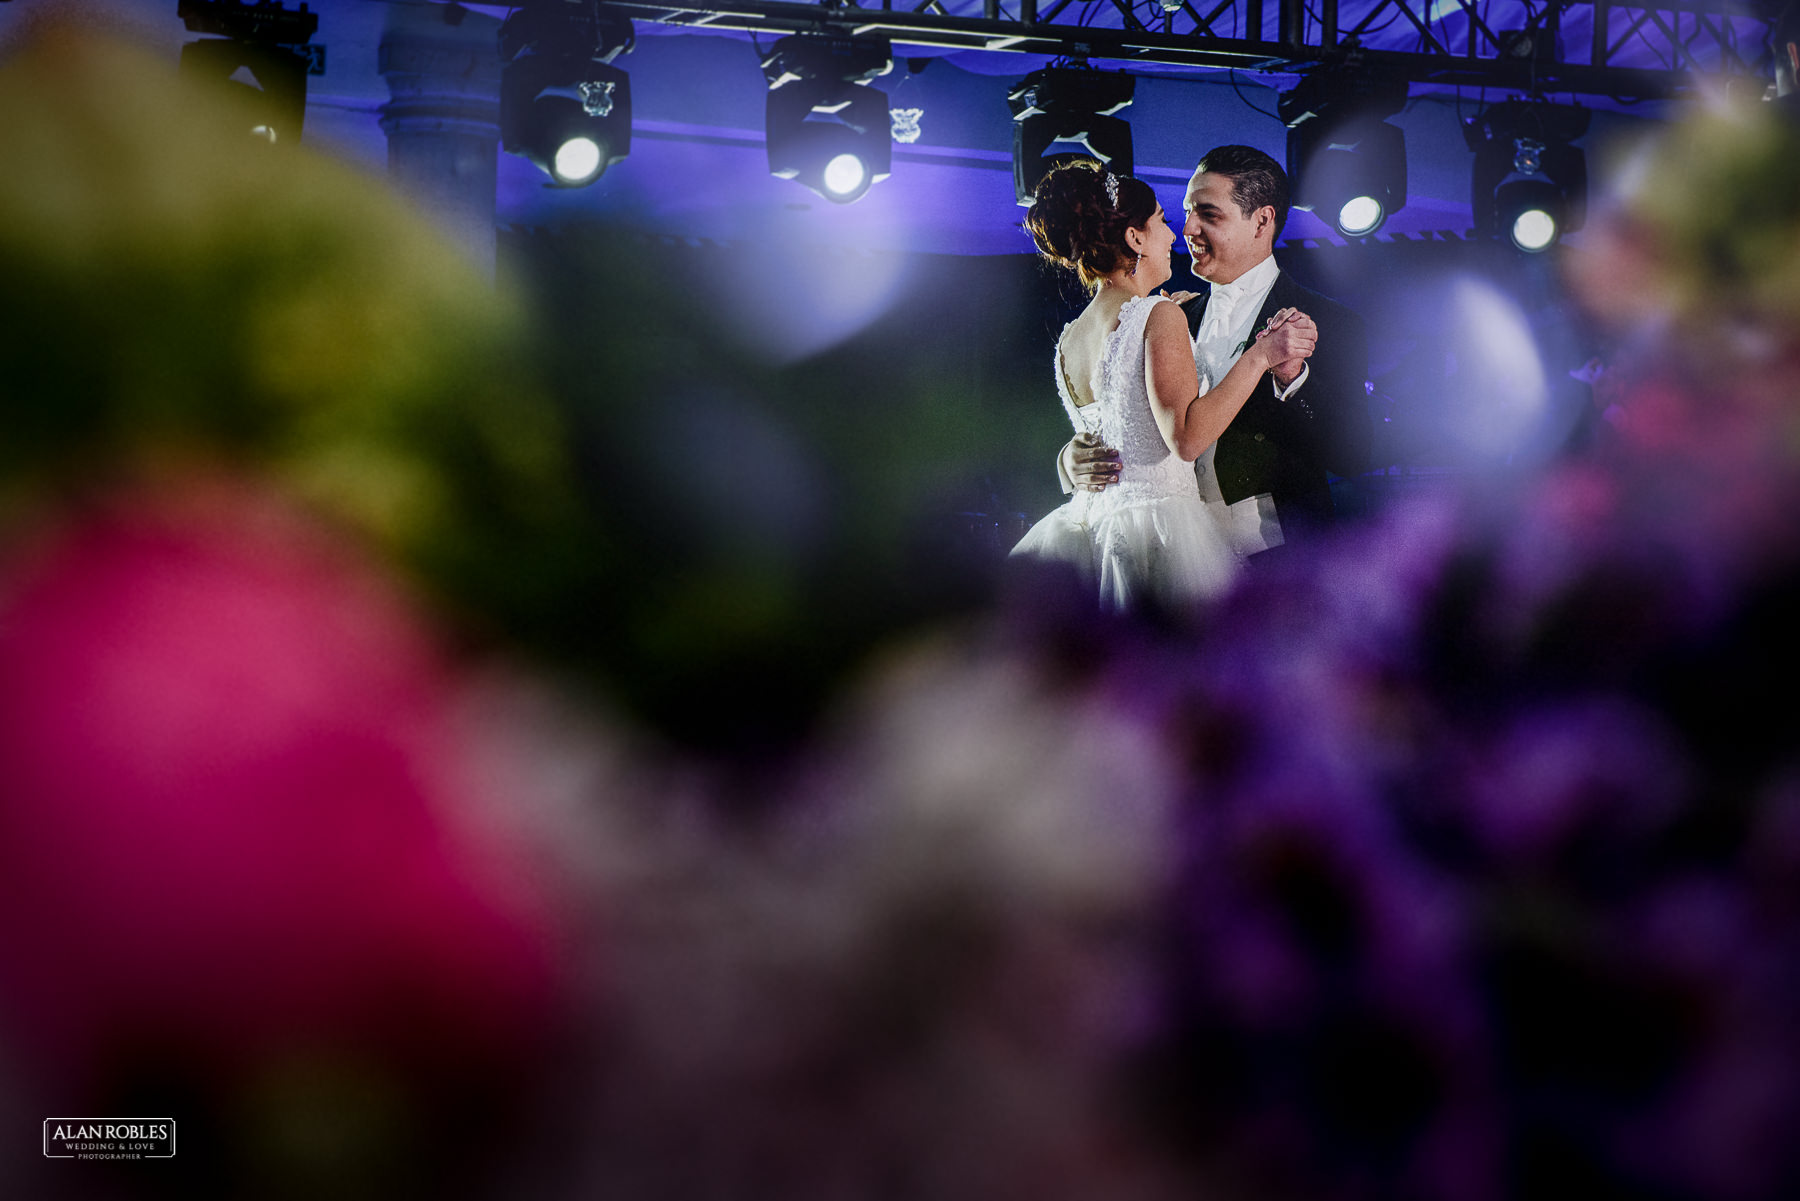 Alan Robles fotografo de bodas guadalajara - LyP Hotel Demetria-65